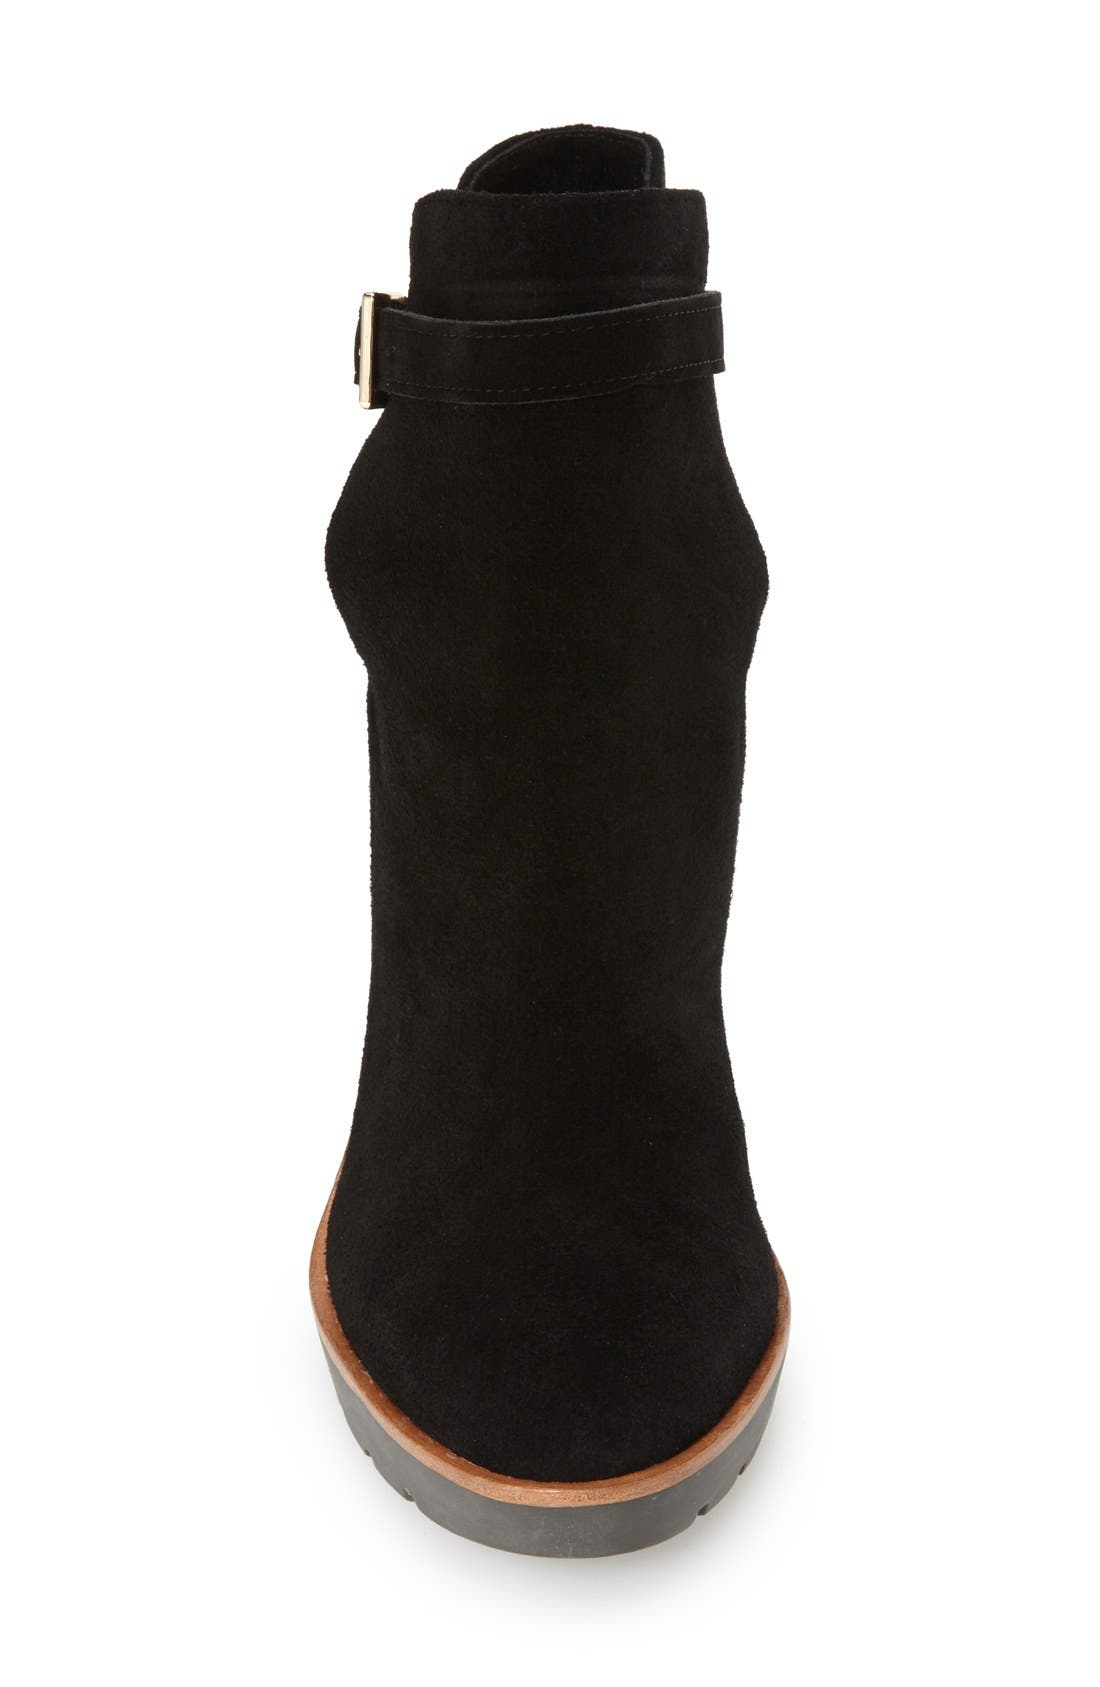 Alternate Image 3  - kate spade new york 'gem' boot (Women)